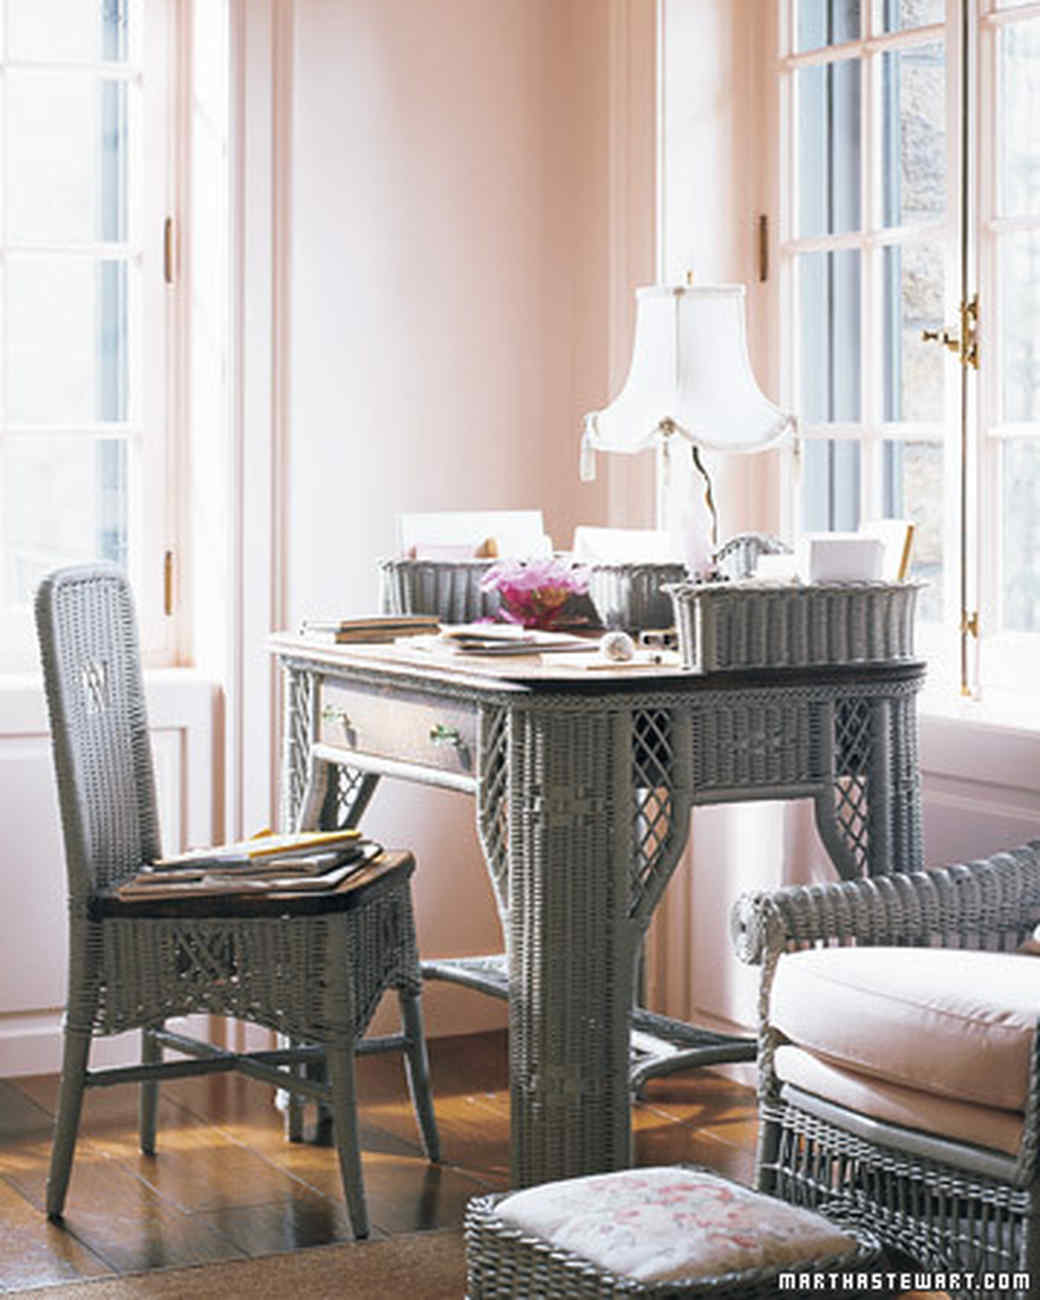 Best of Living's Colorful Rooms | Martha Stewart on Martha Stewart Wicker id=66718